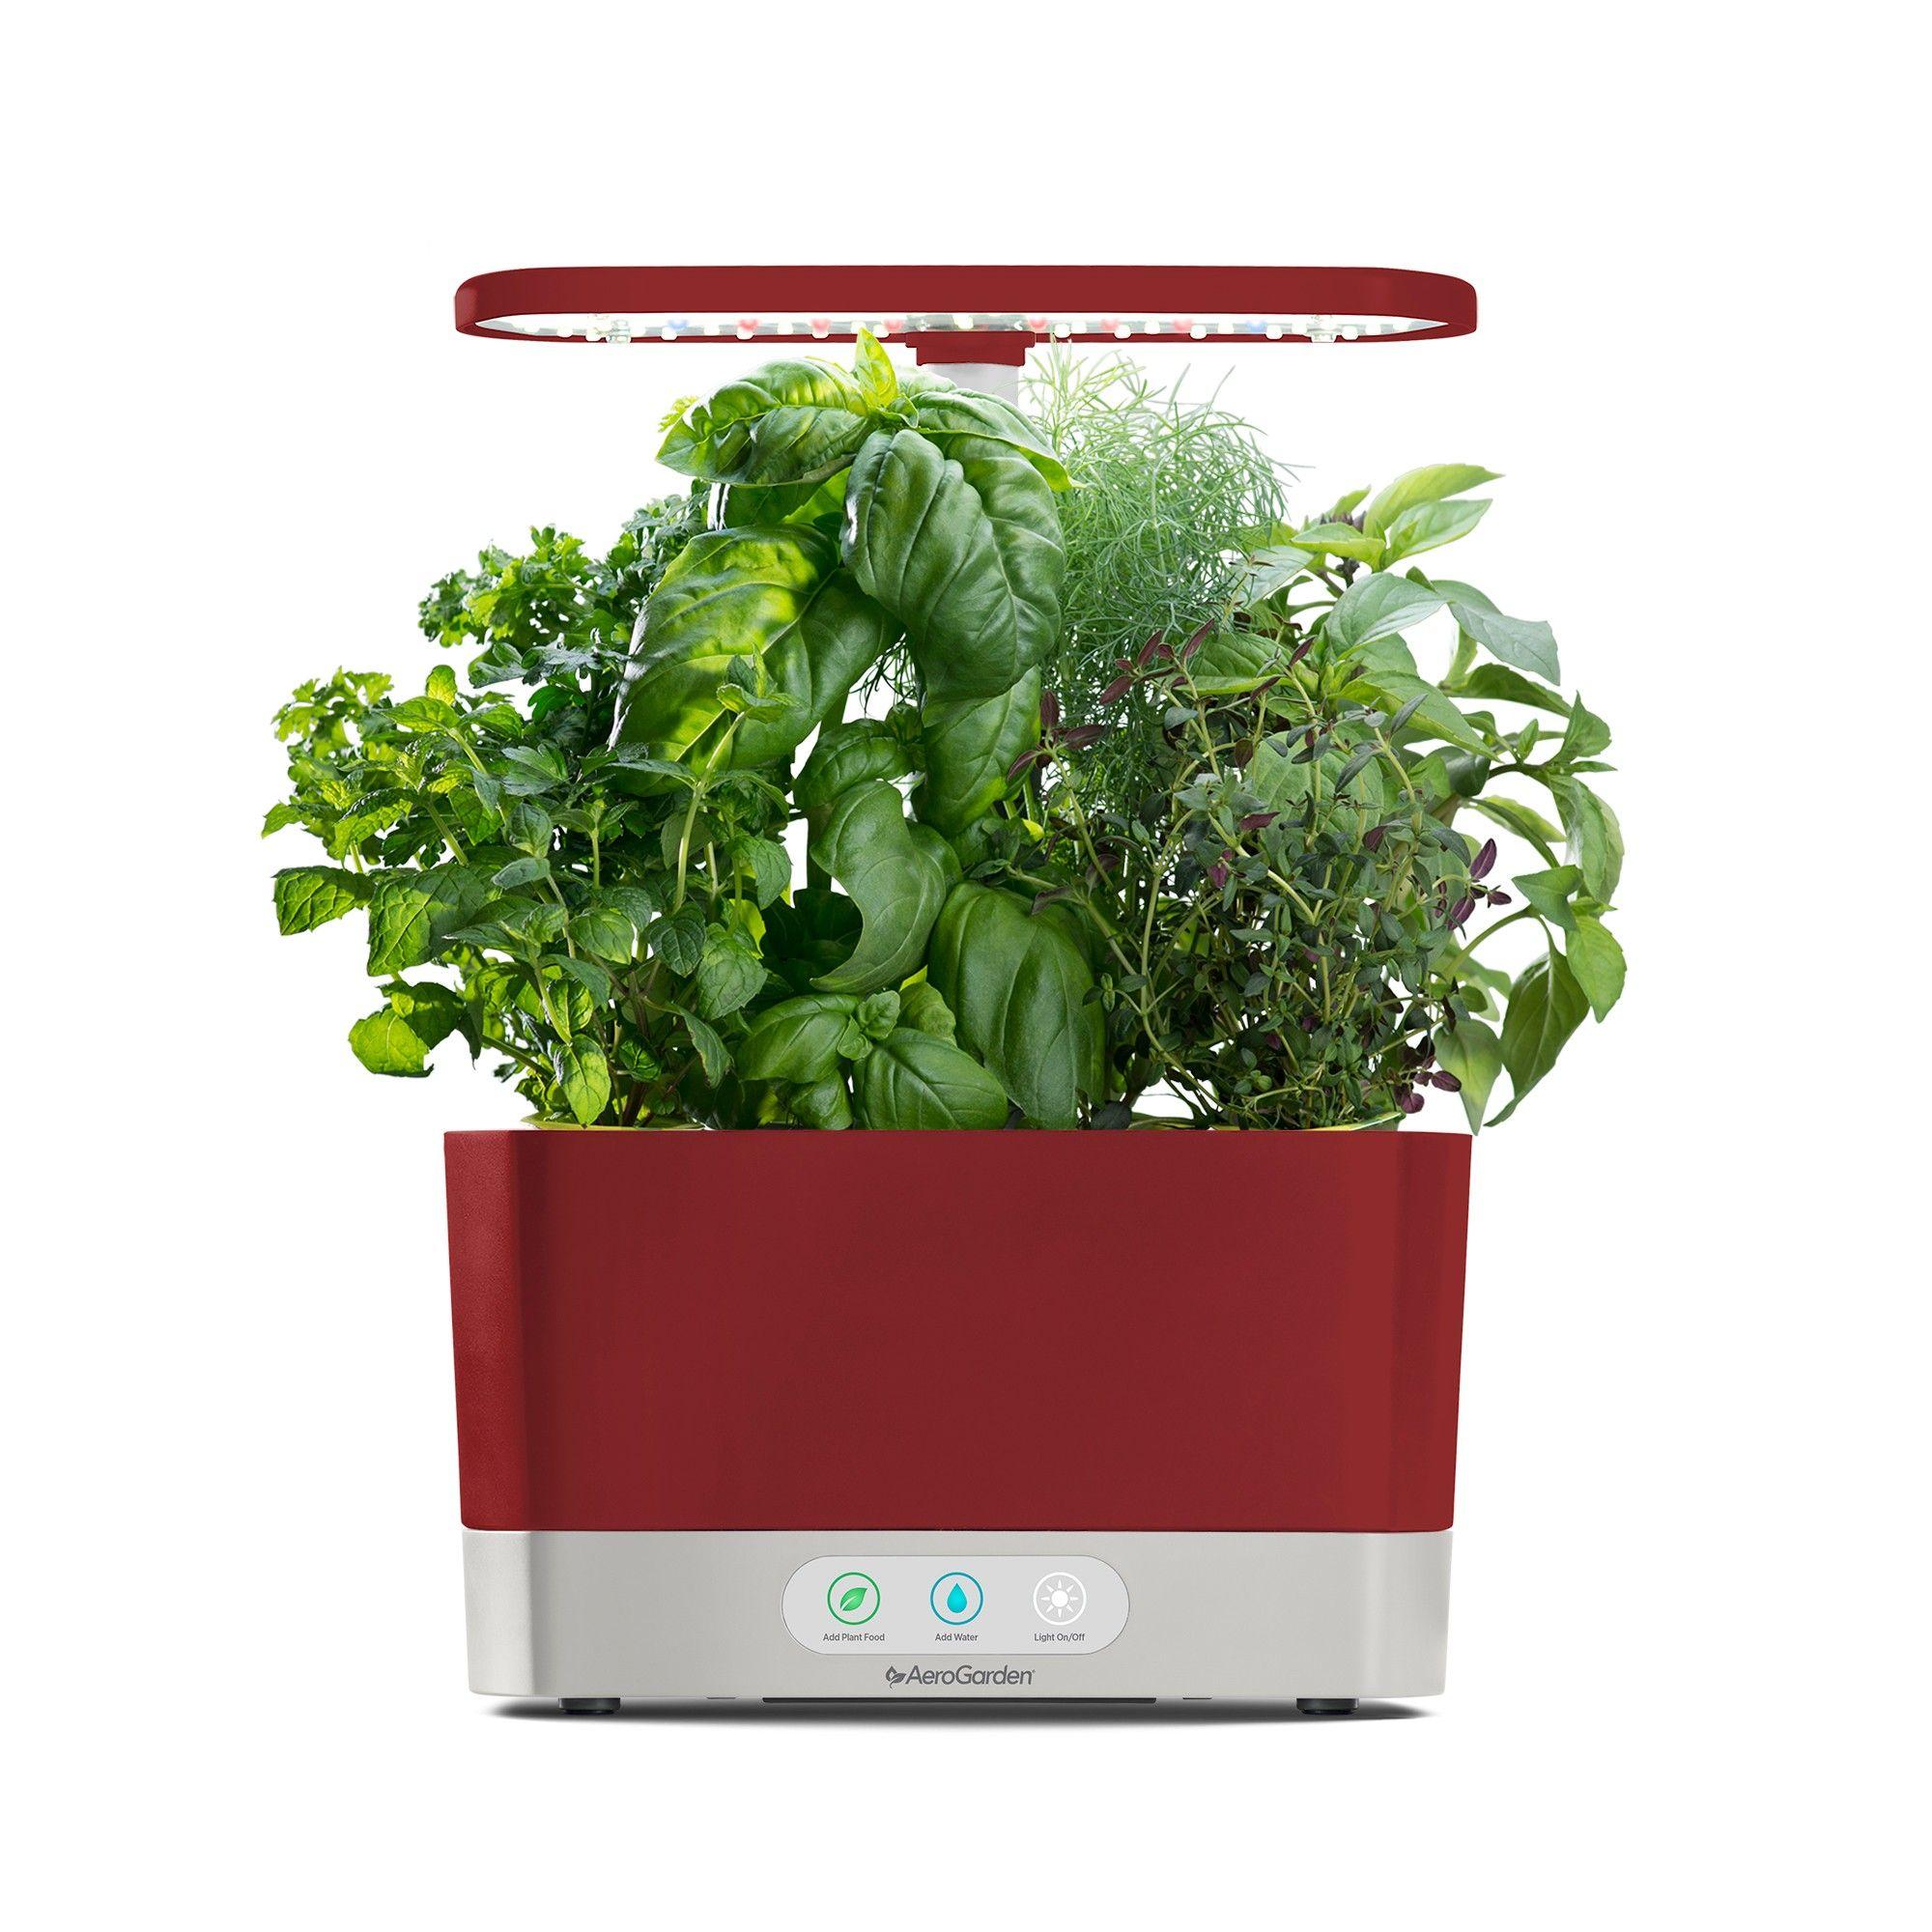 Aerogarden Harvest With Gourmet Herbs 6 Pod Seed Kit Red 640 x 480